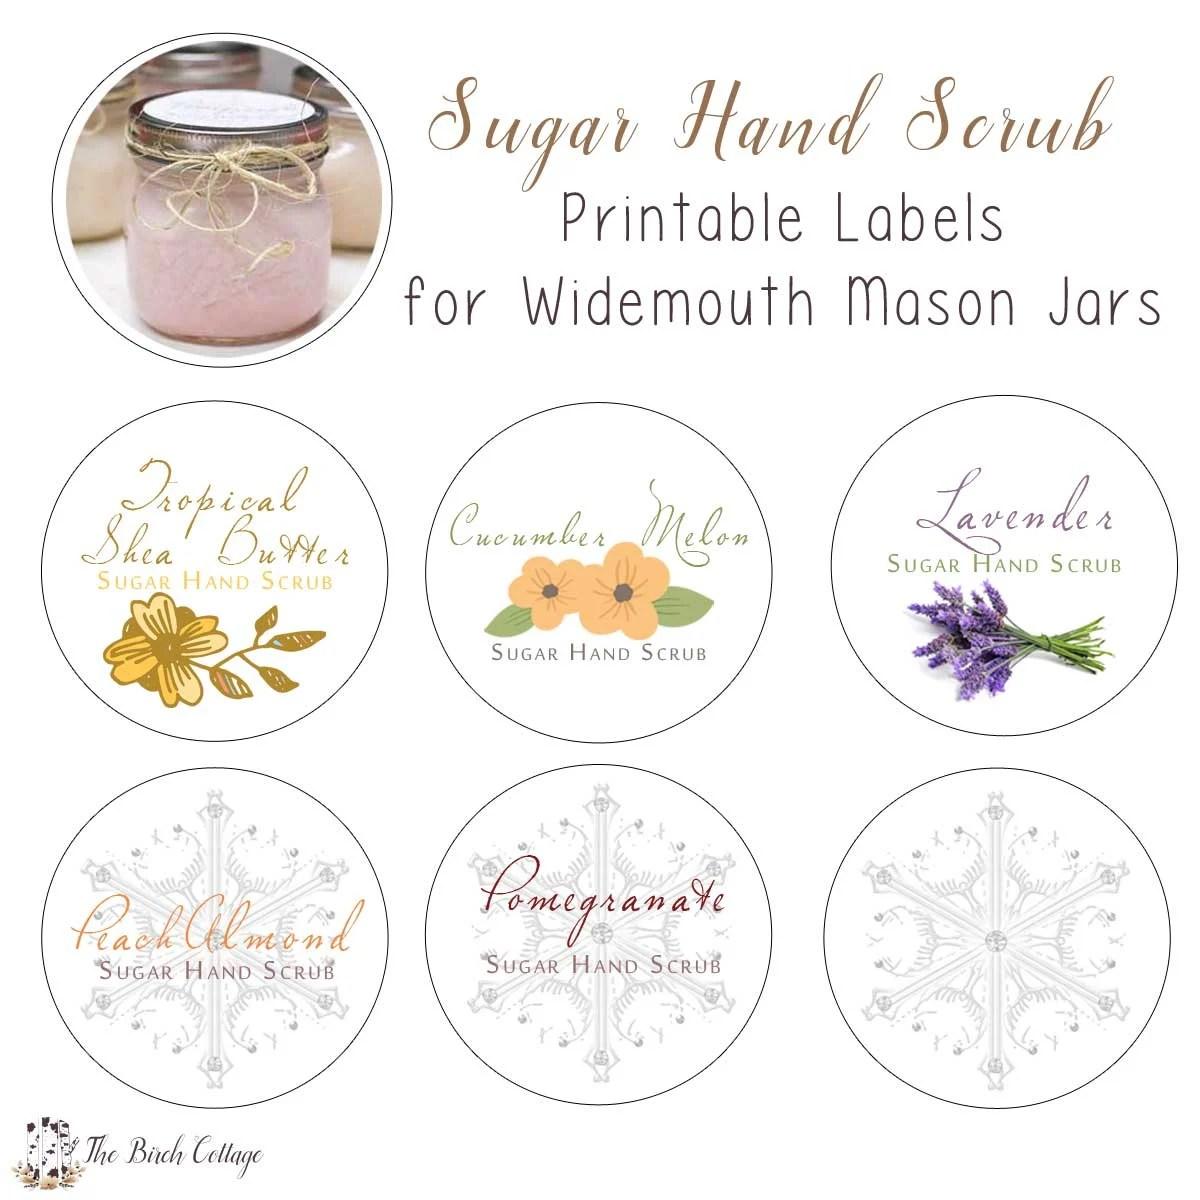 New Diy Sugar Hand Scrub Printable Labels